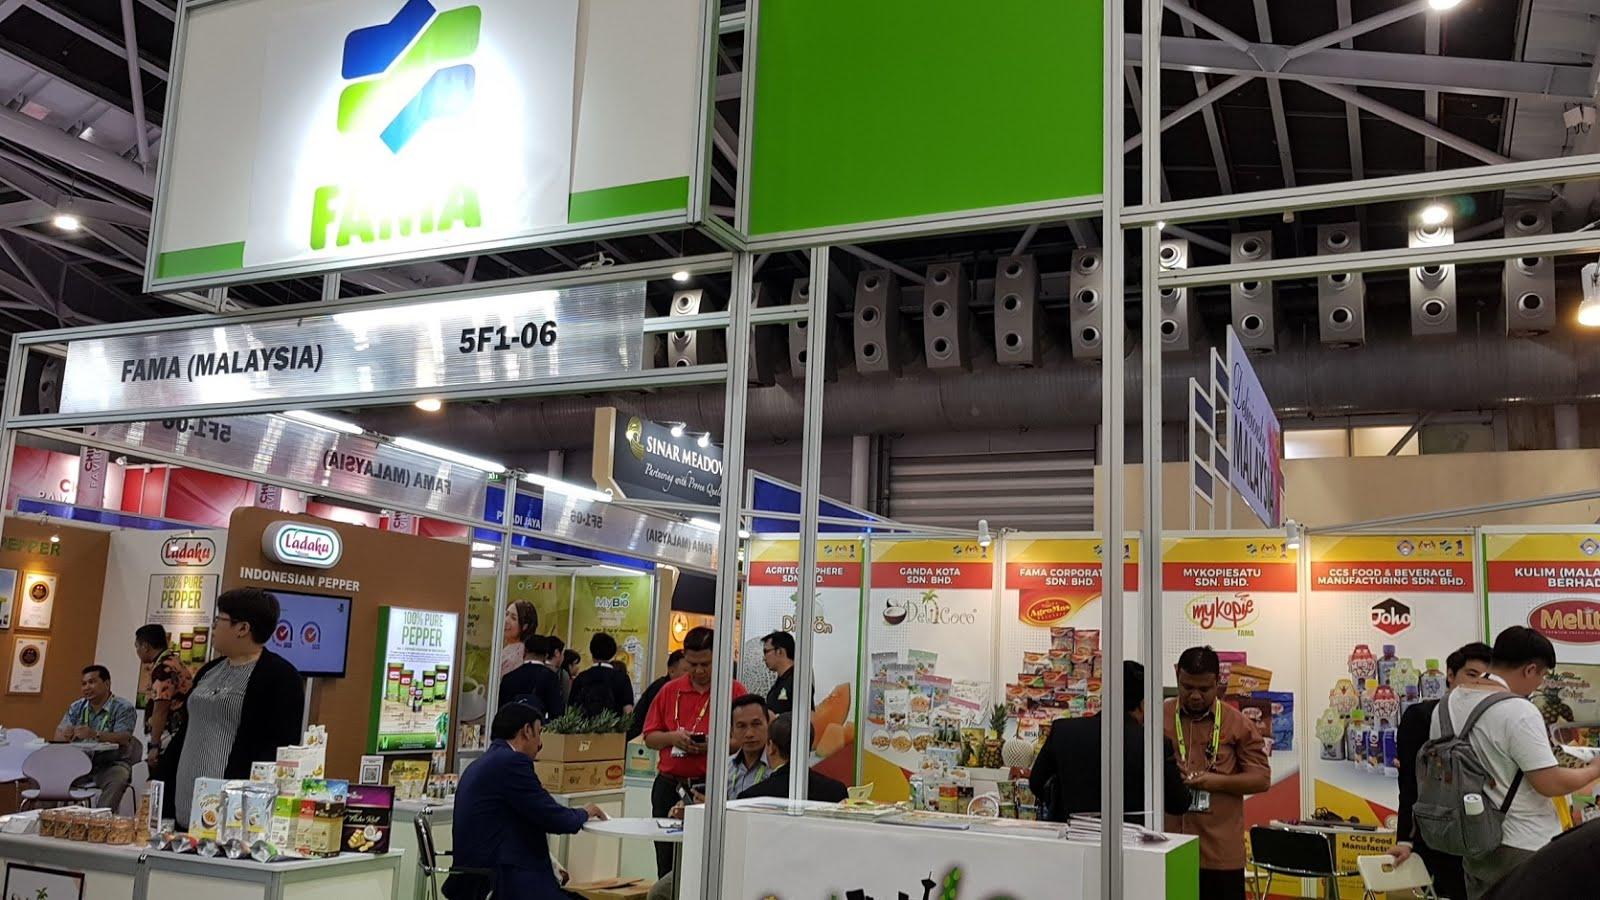 Suroor Asia: Growing halal presence at Food&HotelAsia2018